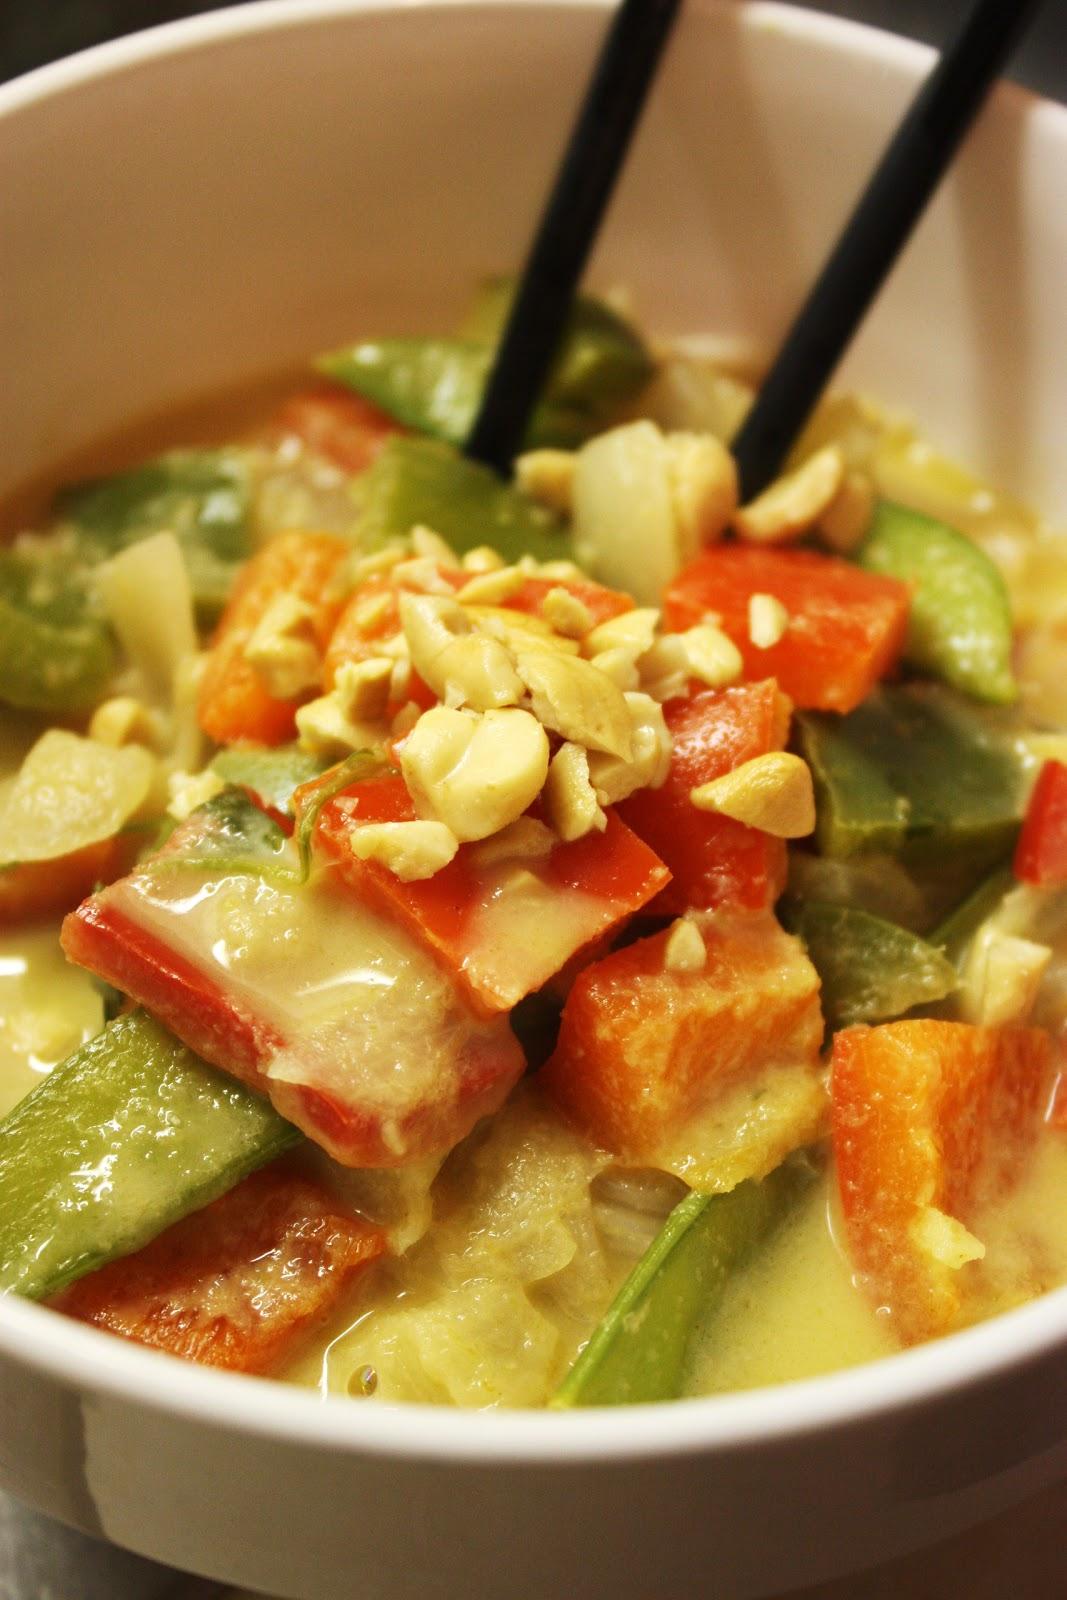 Veganess Eats: Peanut-Thai Green Curry